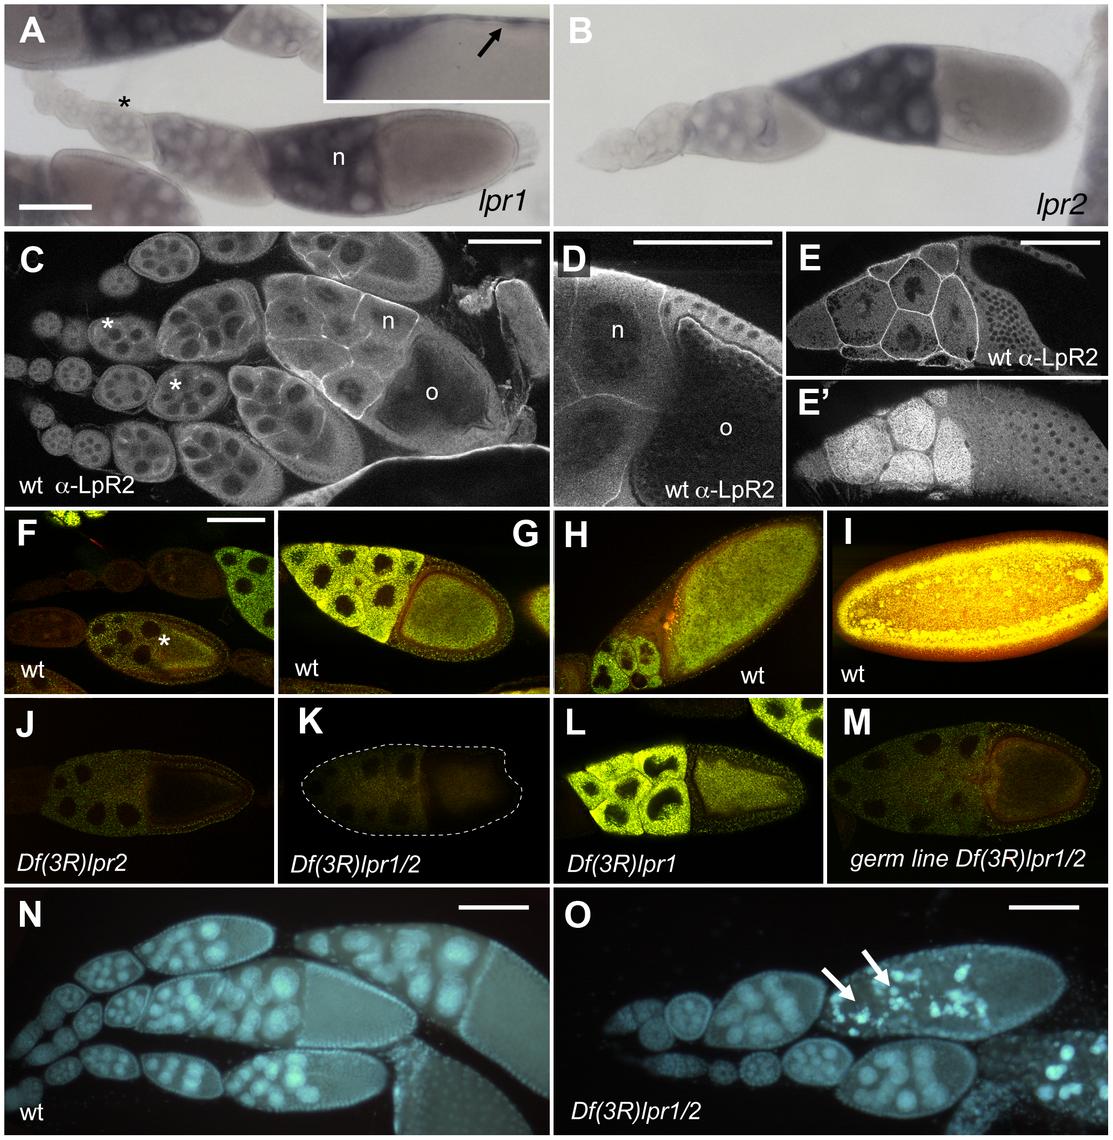 Lpr2 is required for the uptake of neutral lipids during <i>Drosophila</i> vitellogenesis.